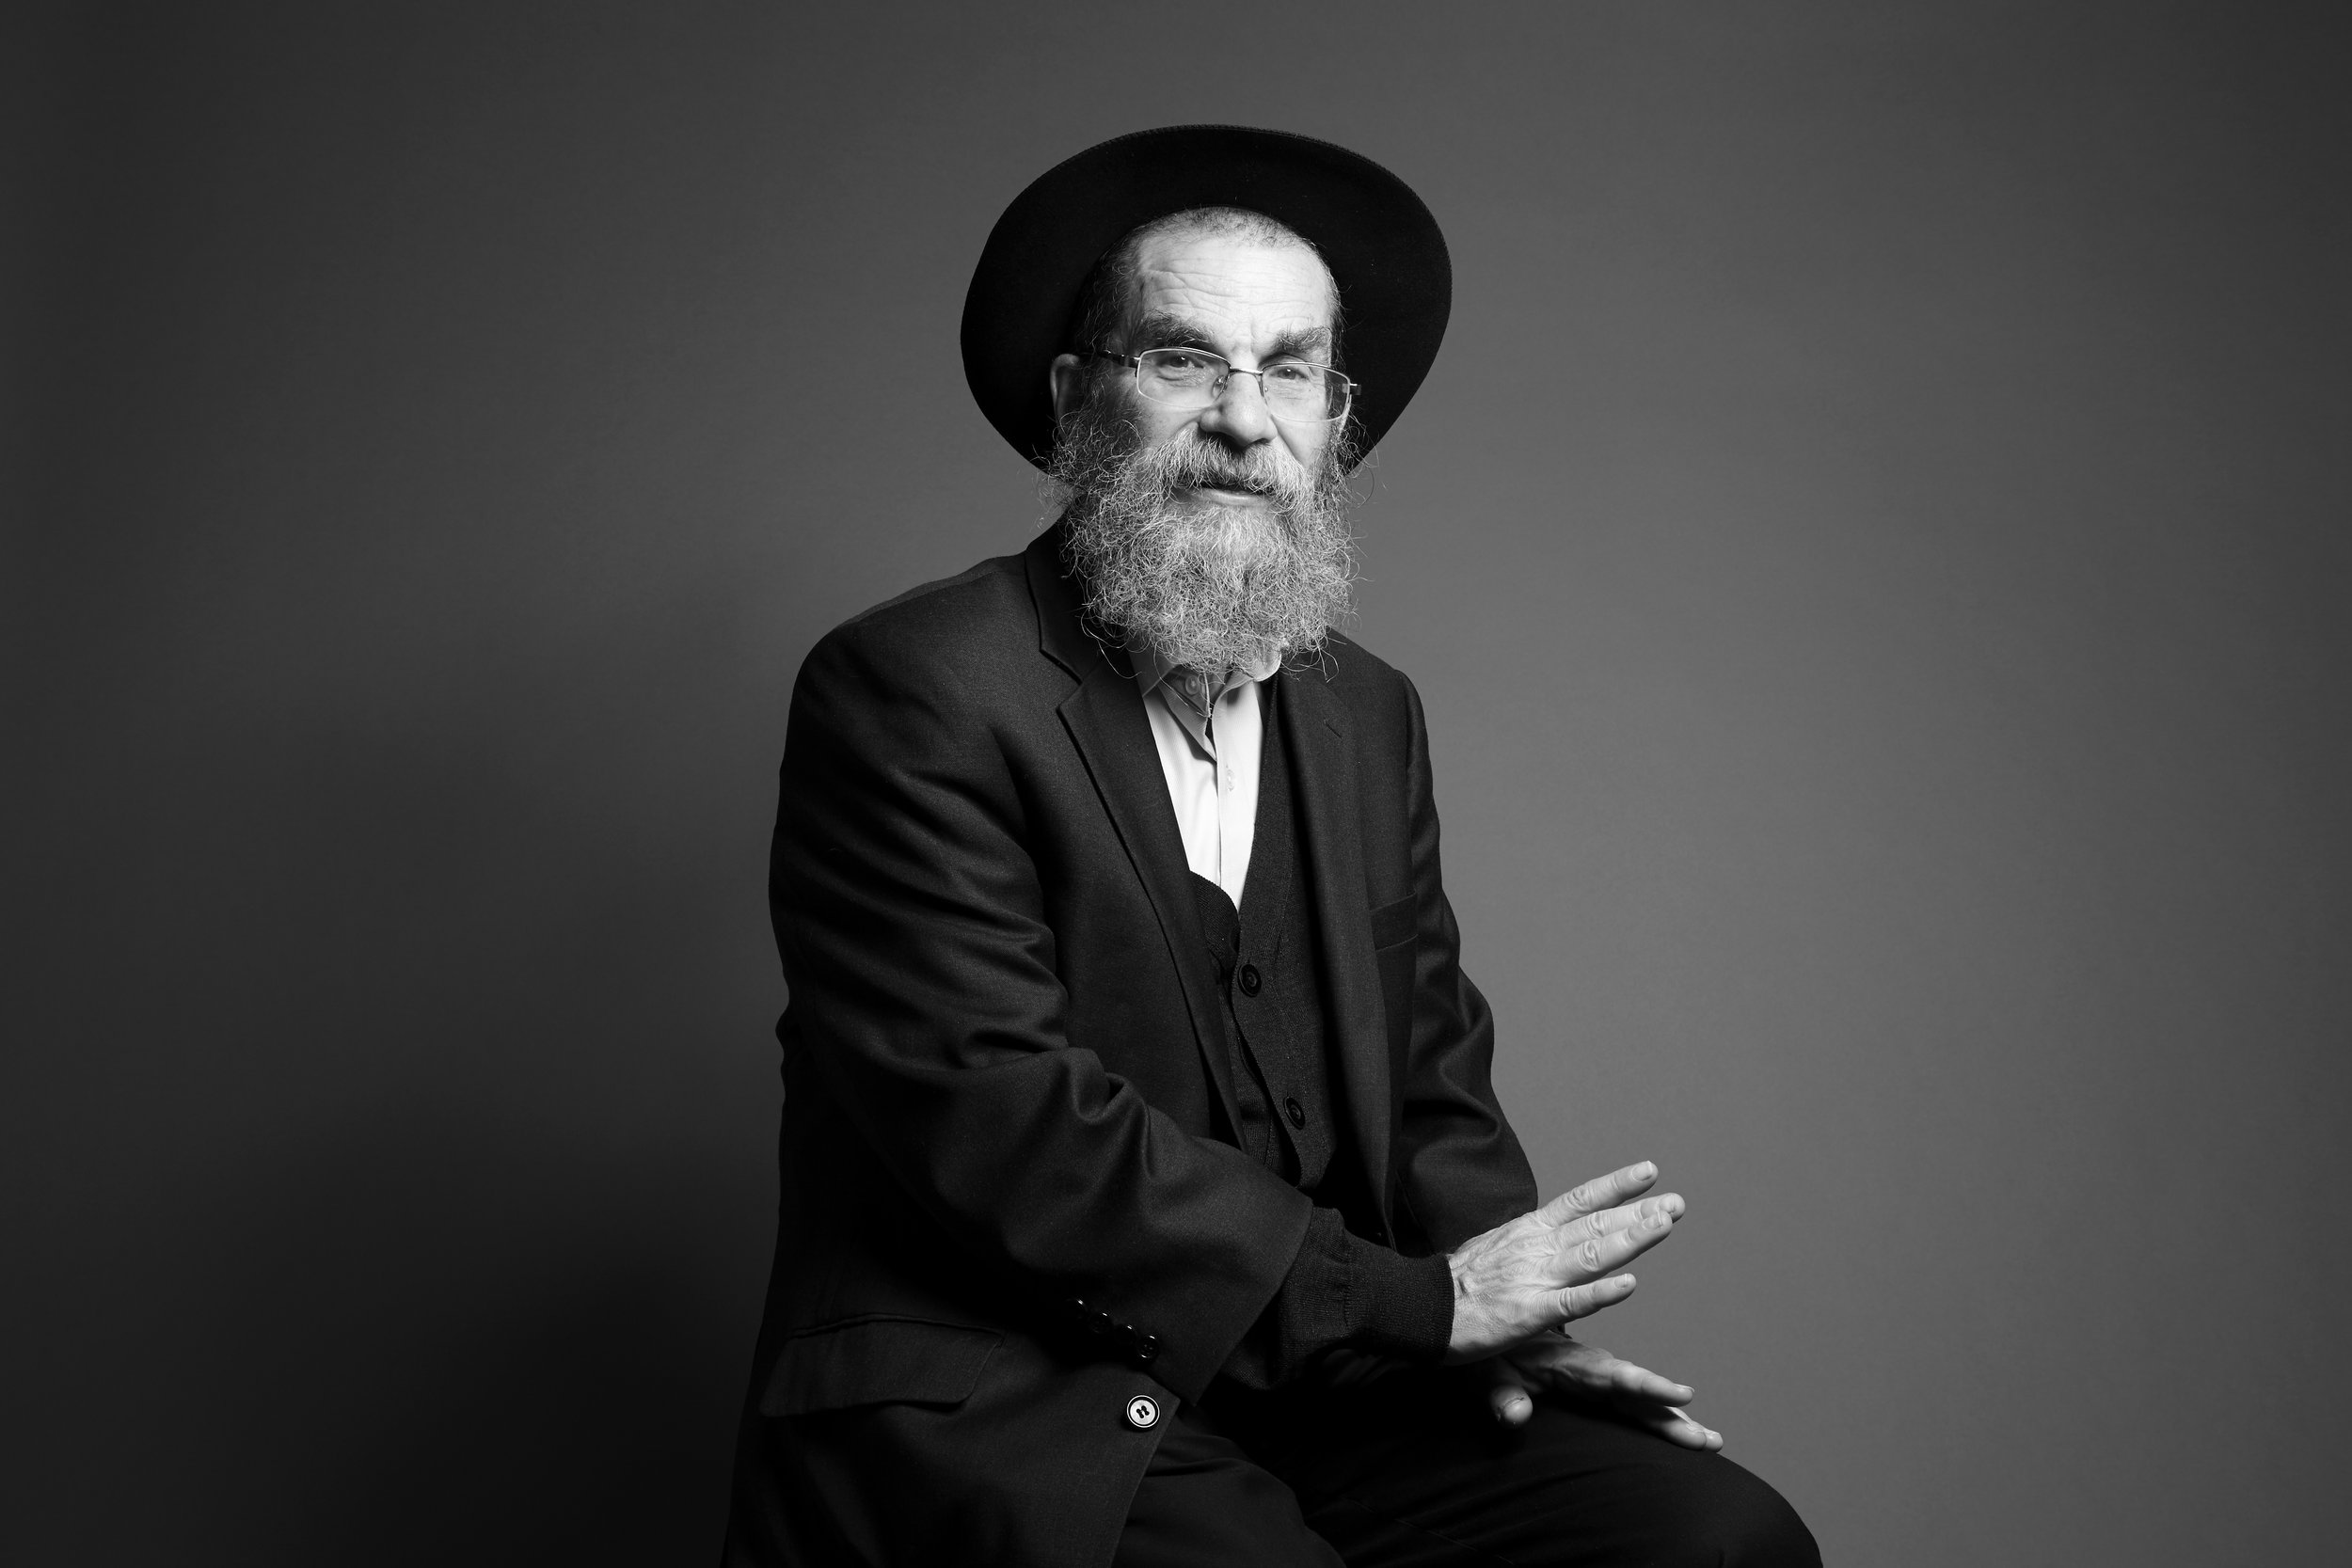 RABBI ELIYAHU TOUGER